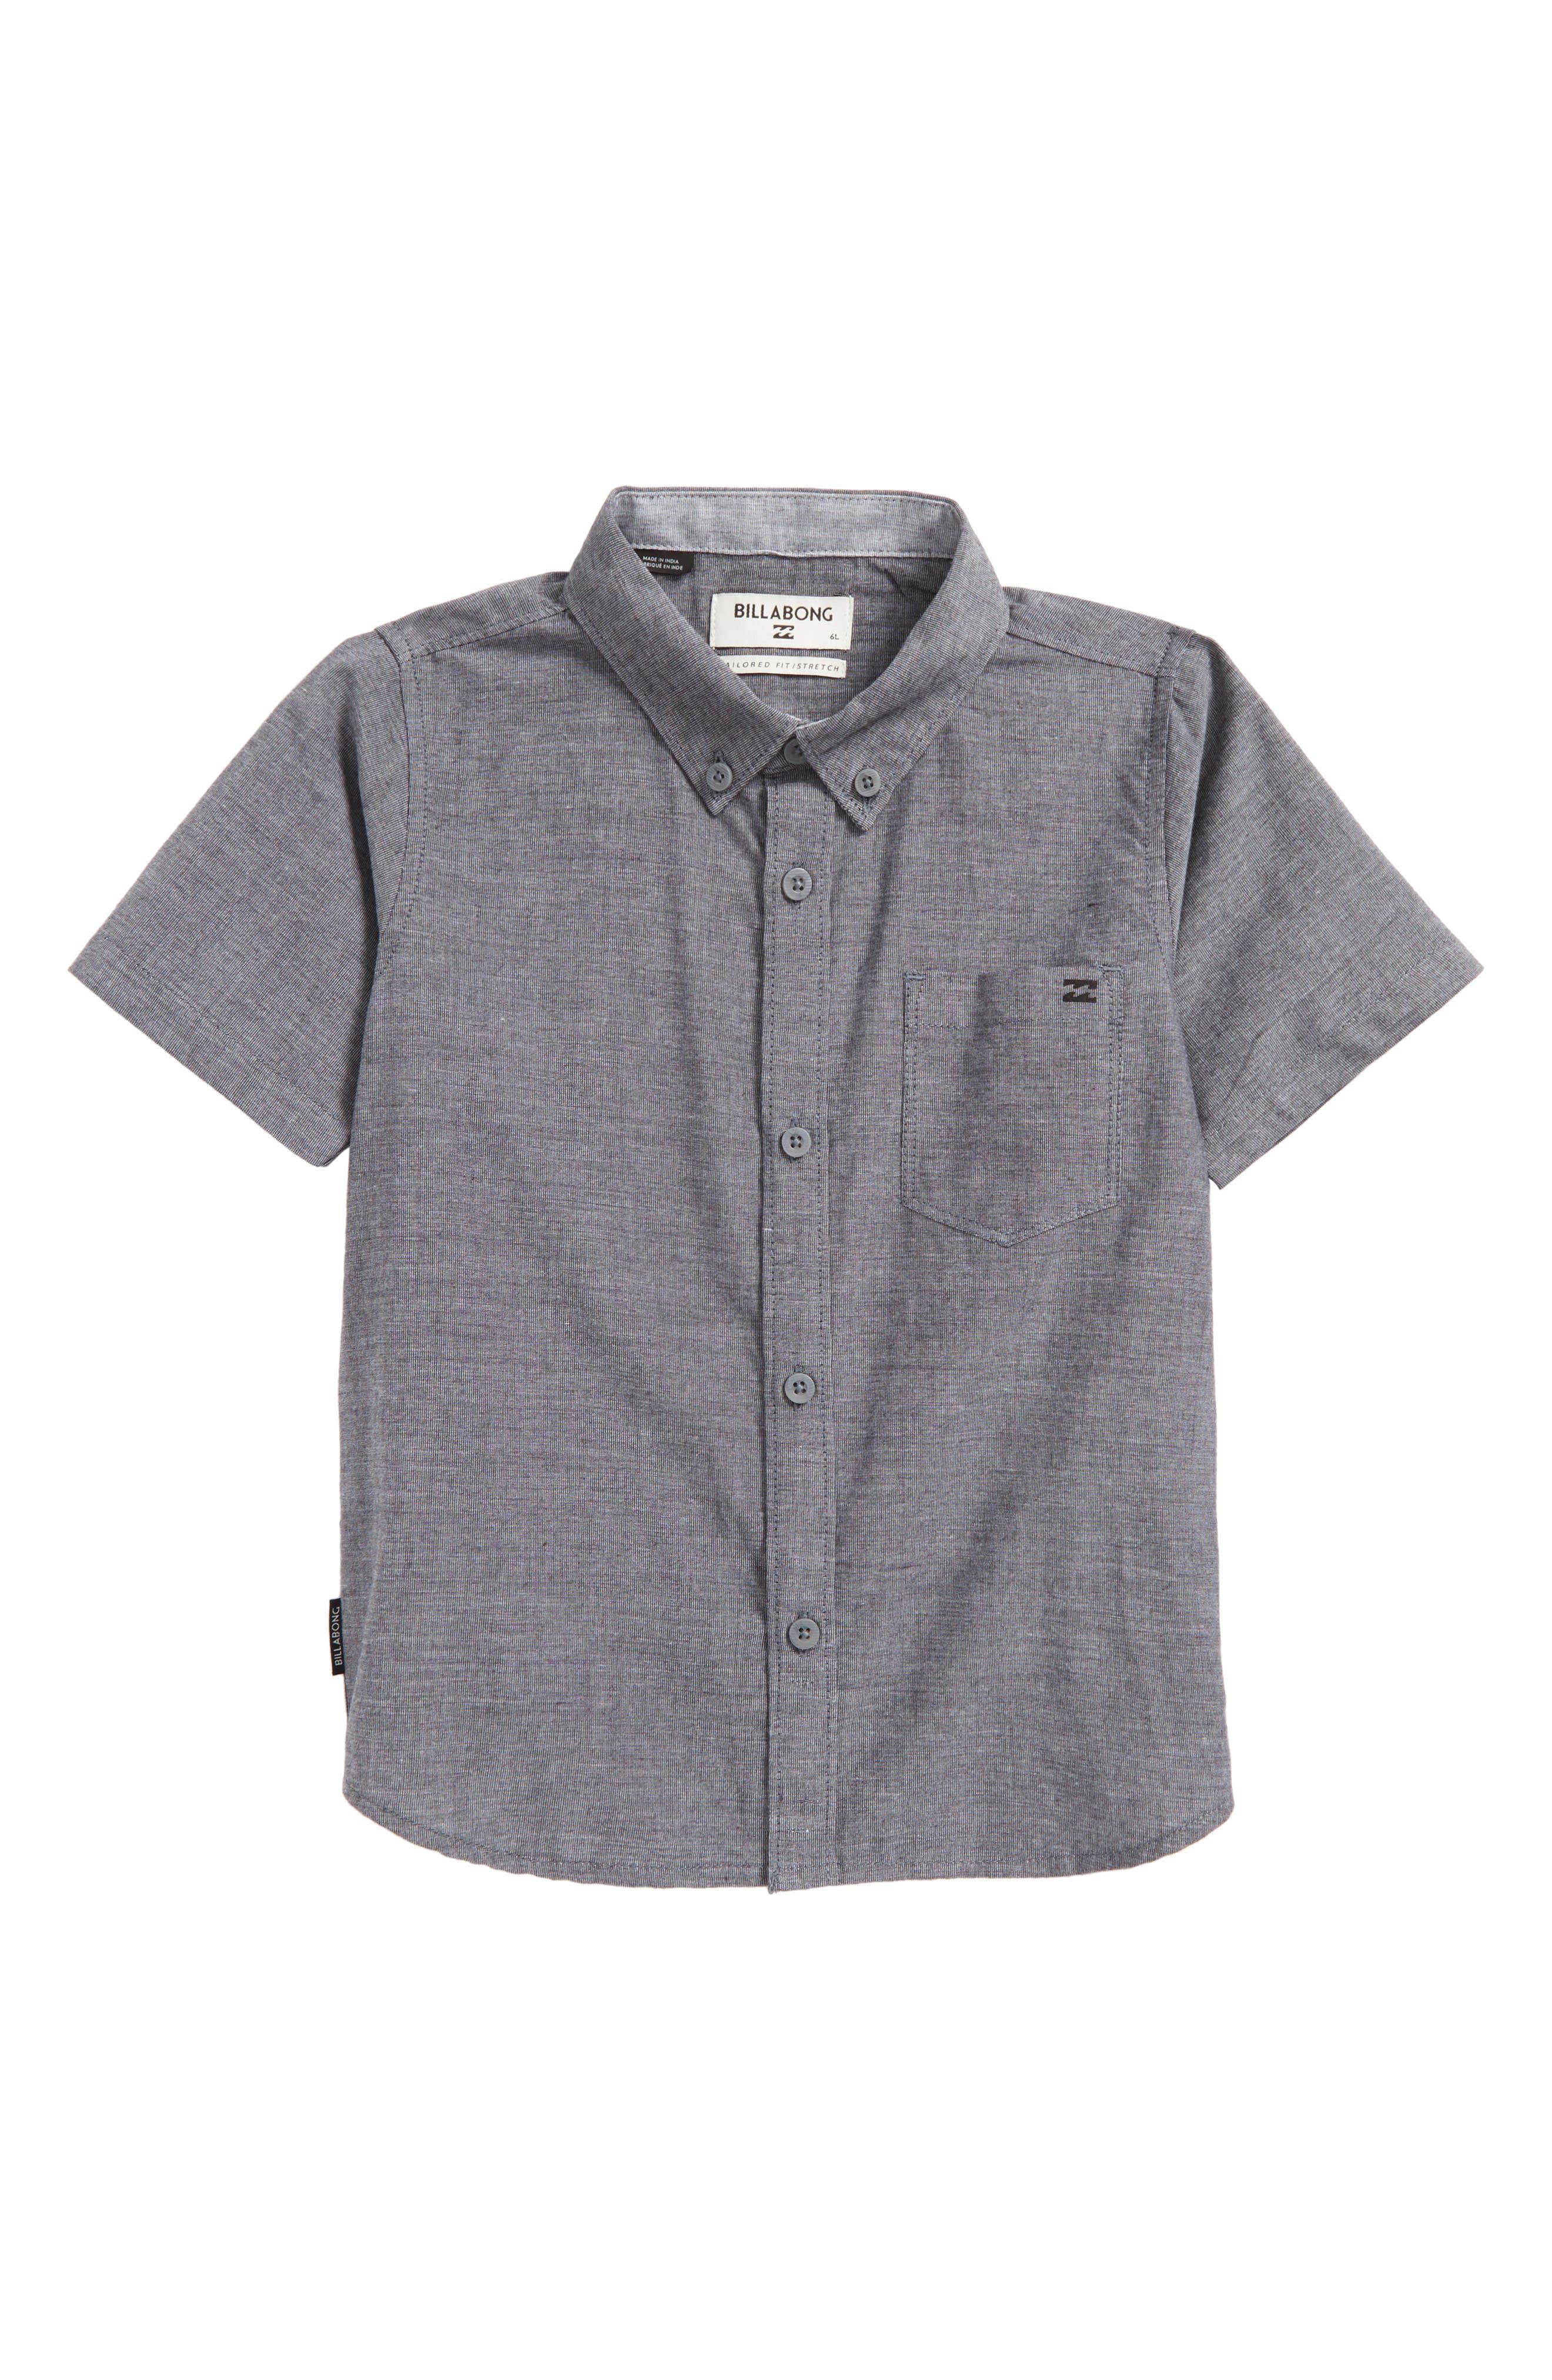 All Day Chambray Woven Shirt,                         Main,                         color, 001